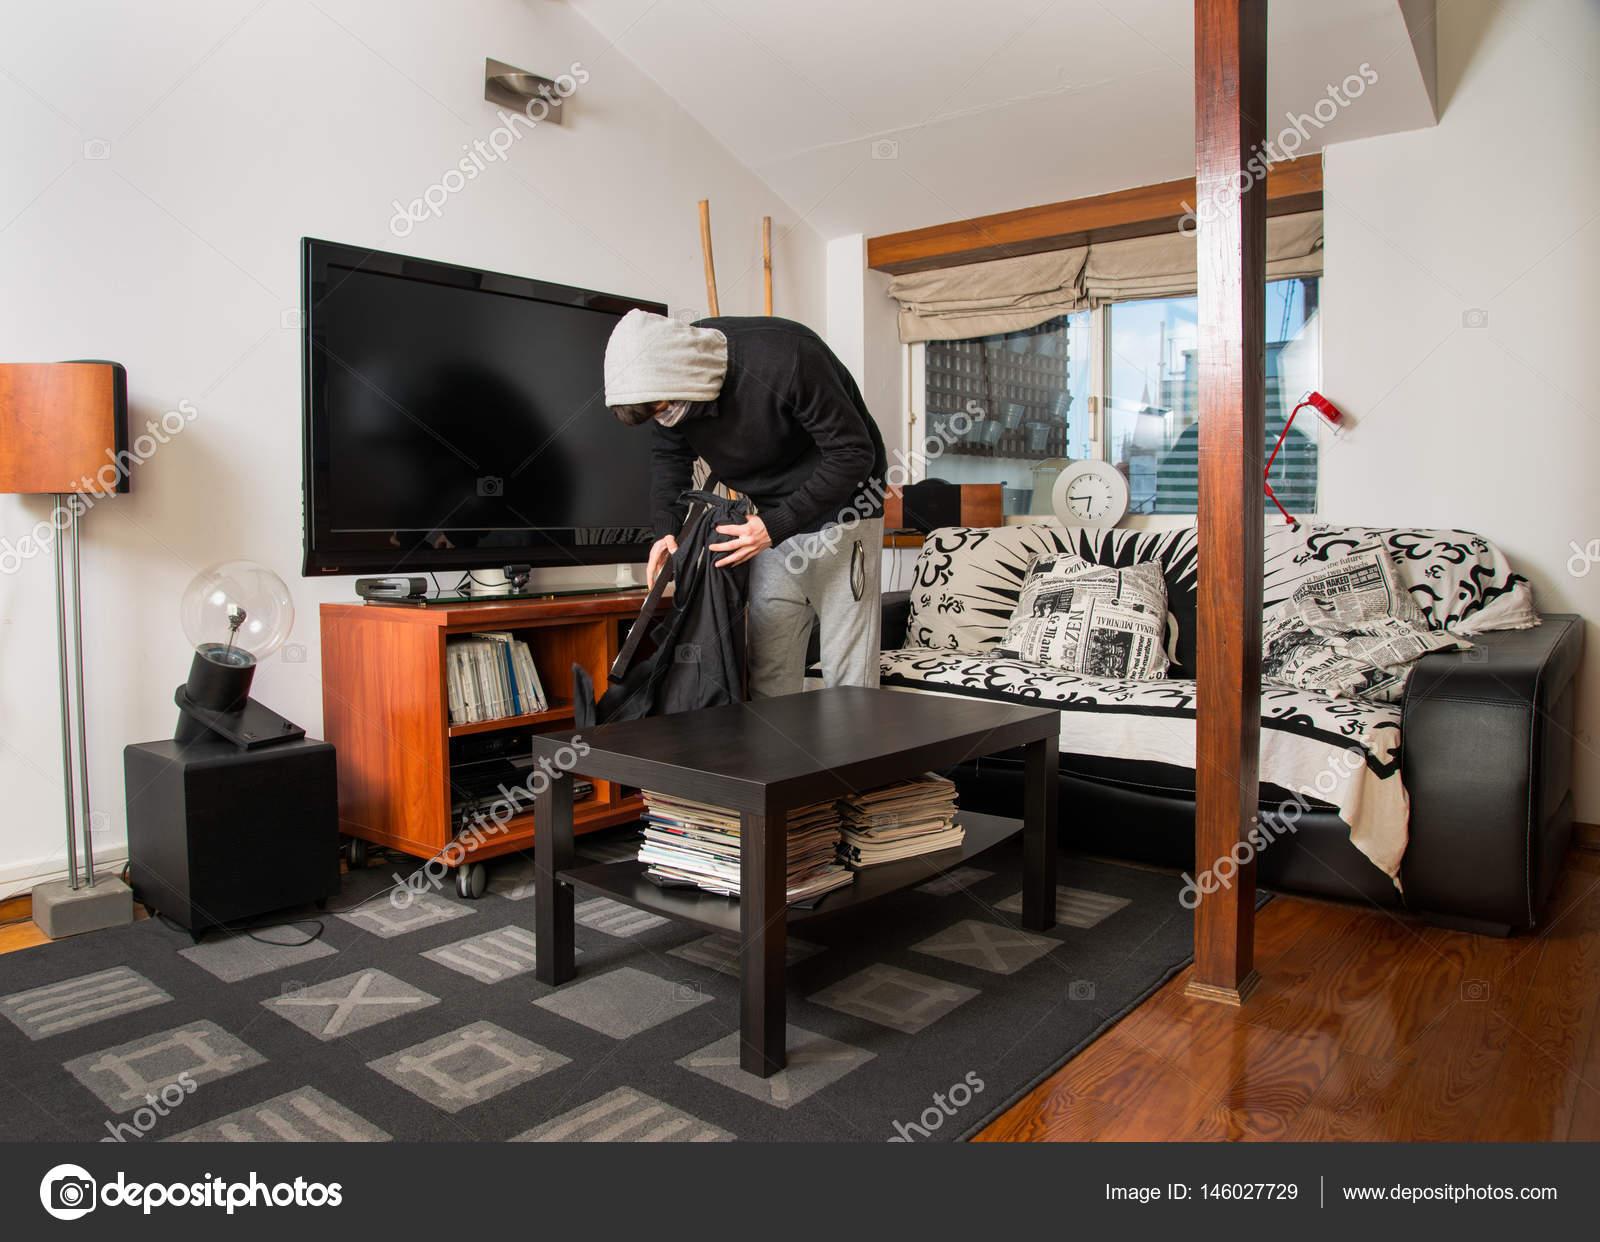 burgler robbing a house stock photo studiof22byricardorocha